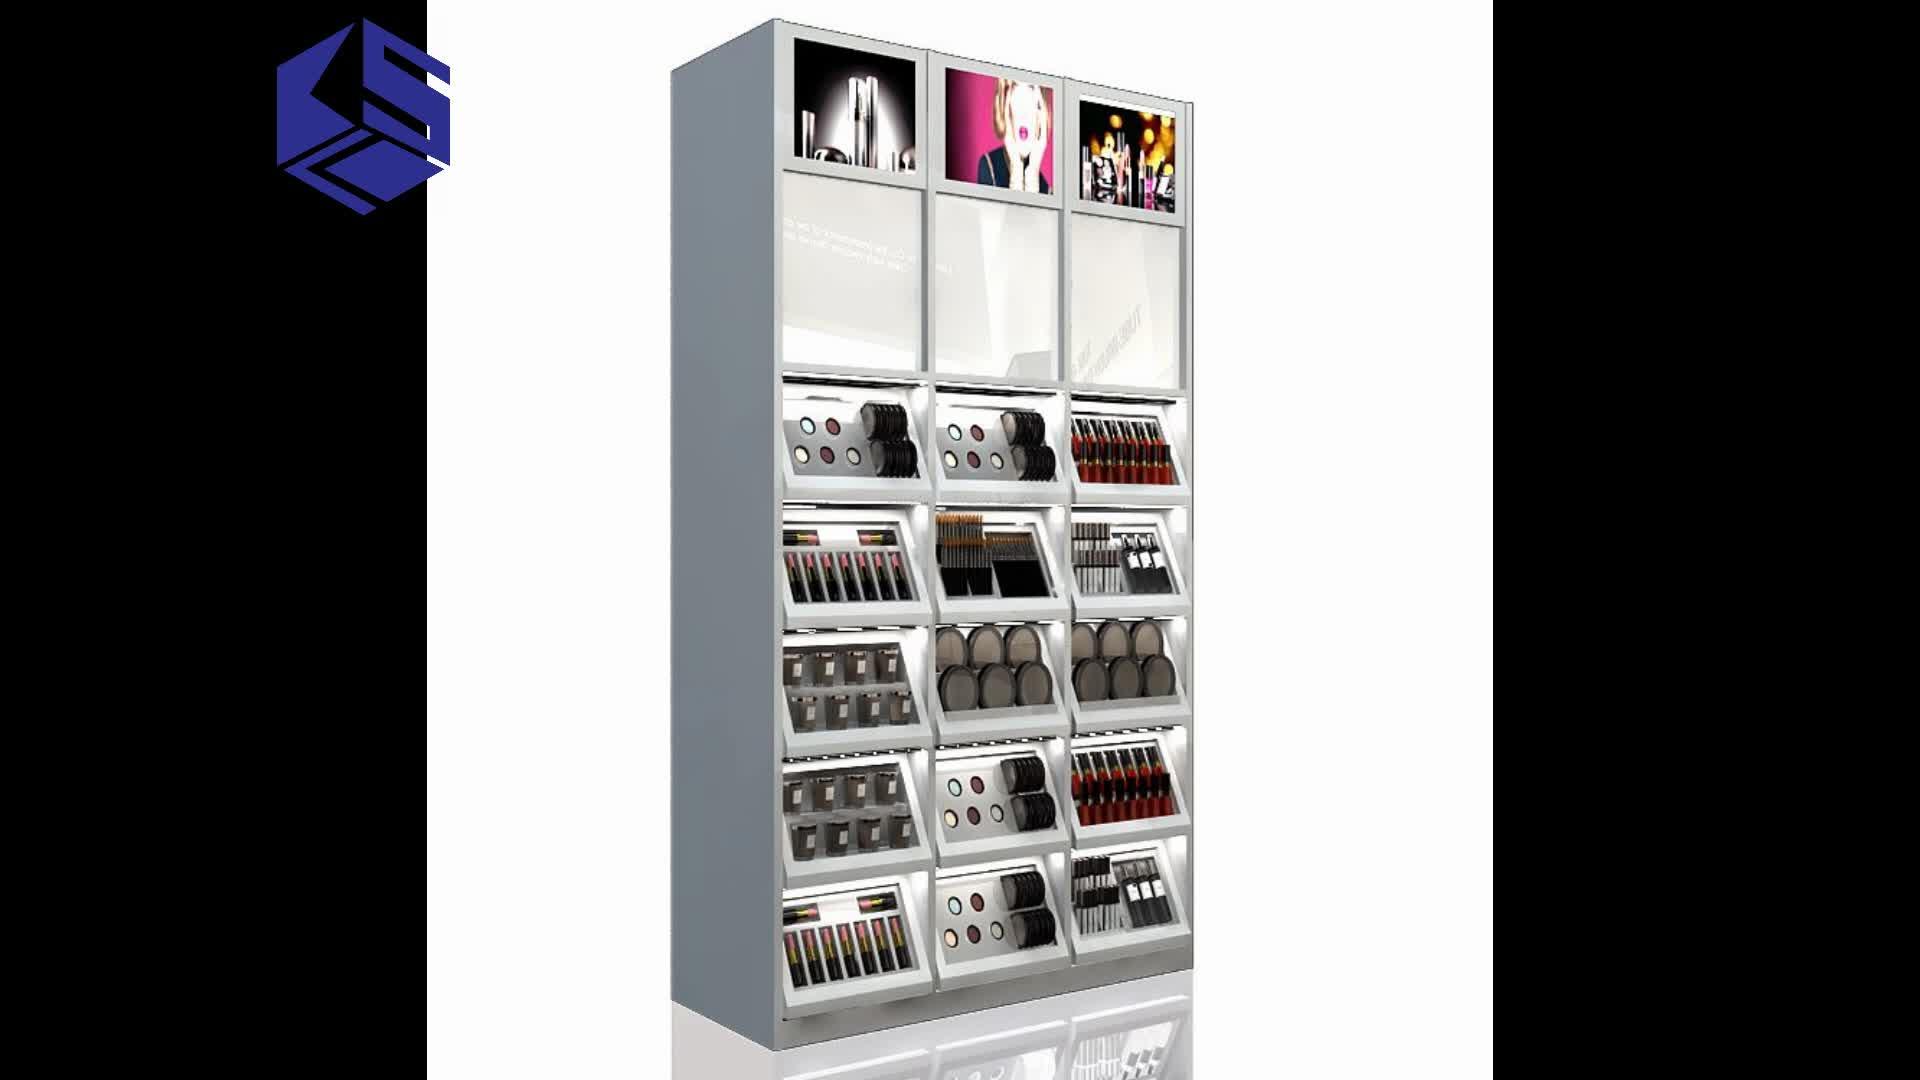 Holz körper acryl logo parfüm machen oben ausstellungsstand kosmetik display gondel